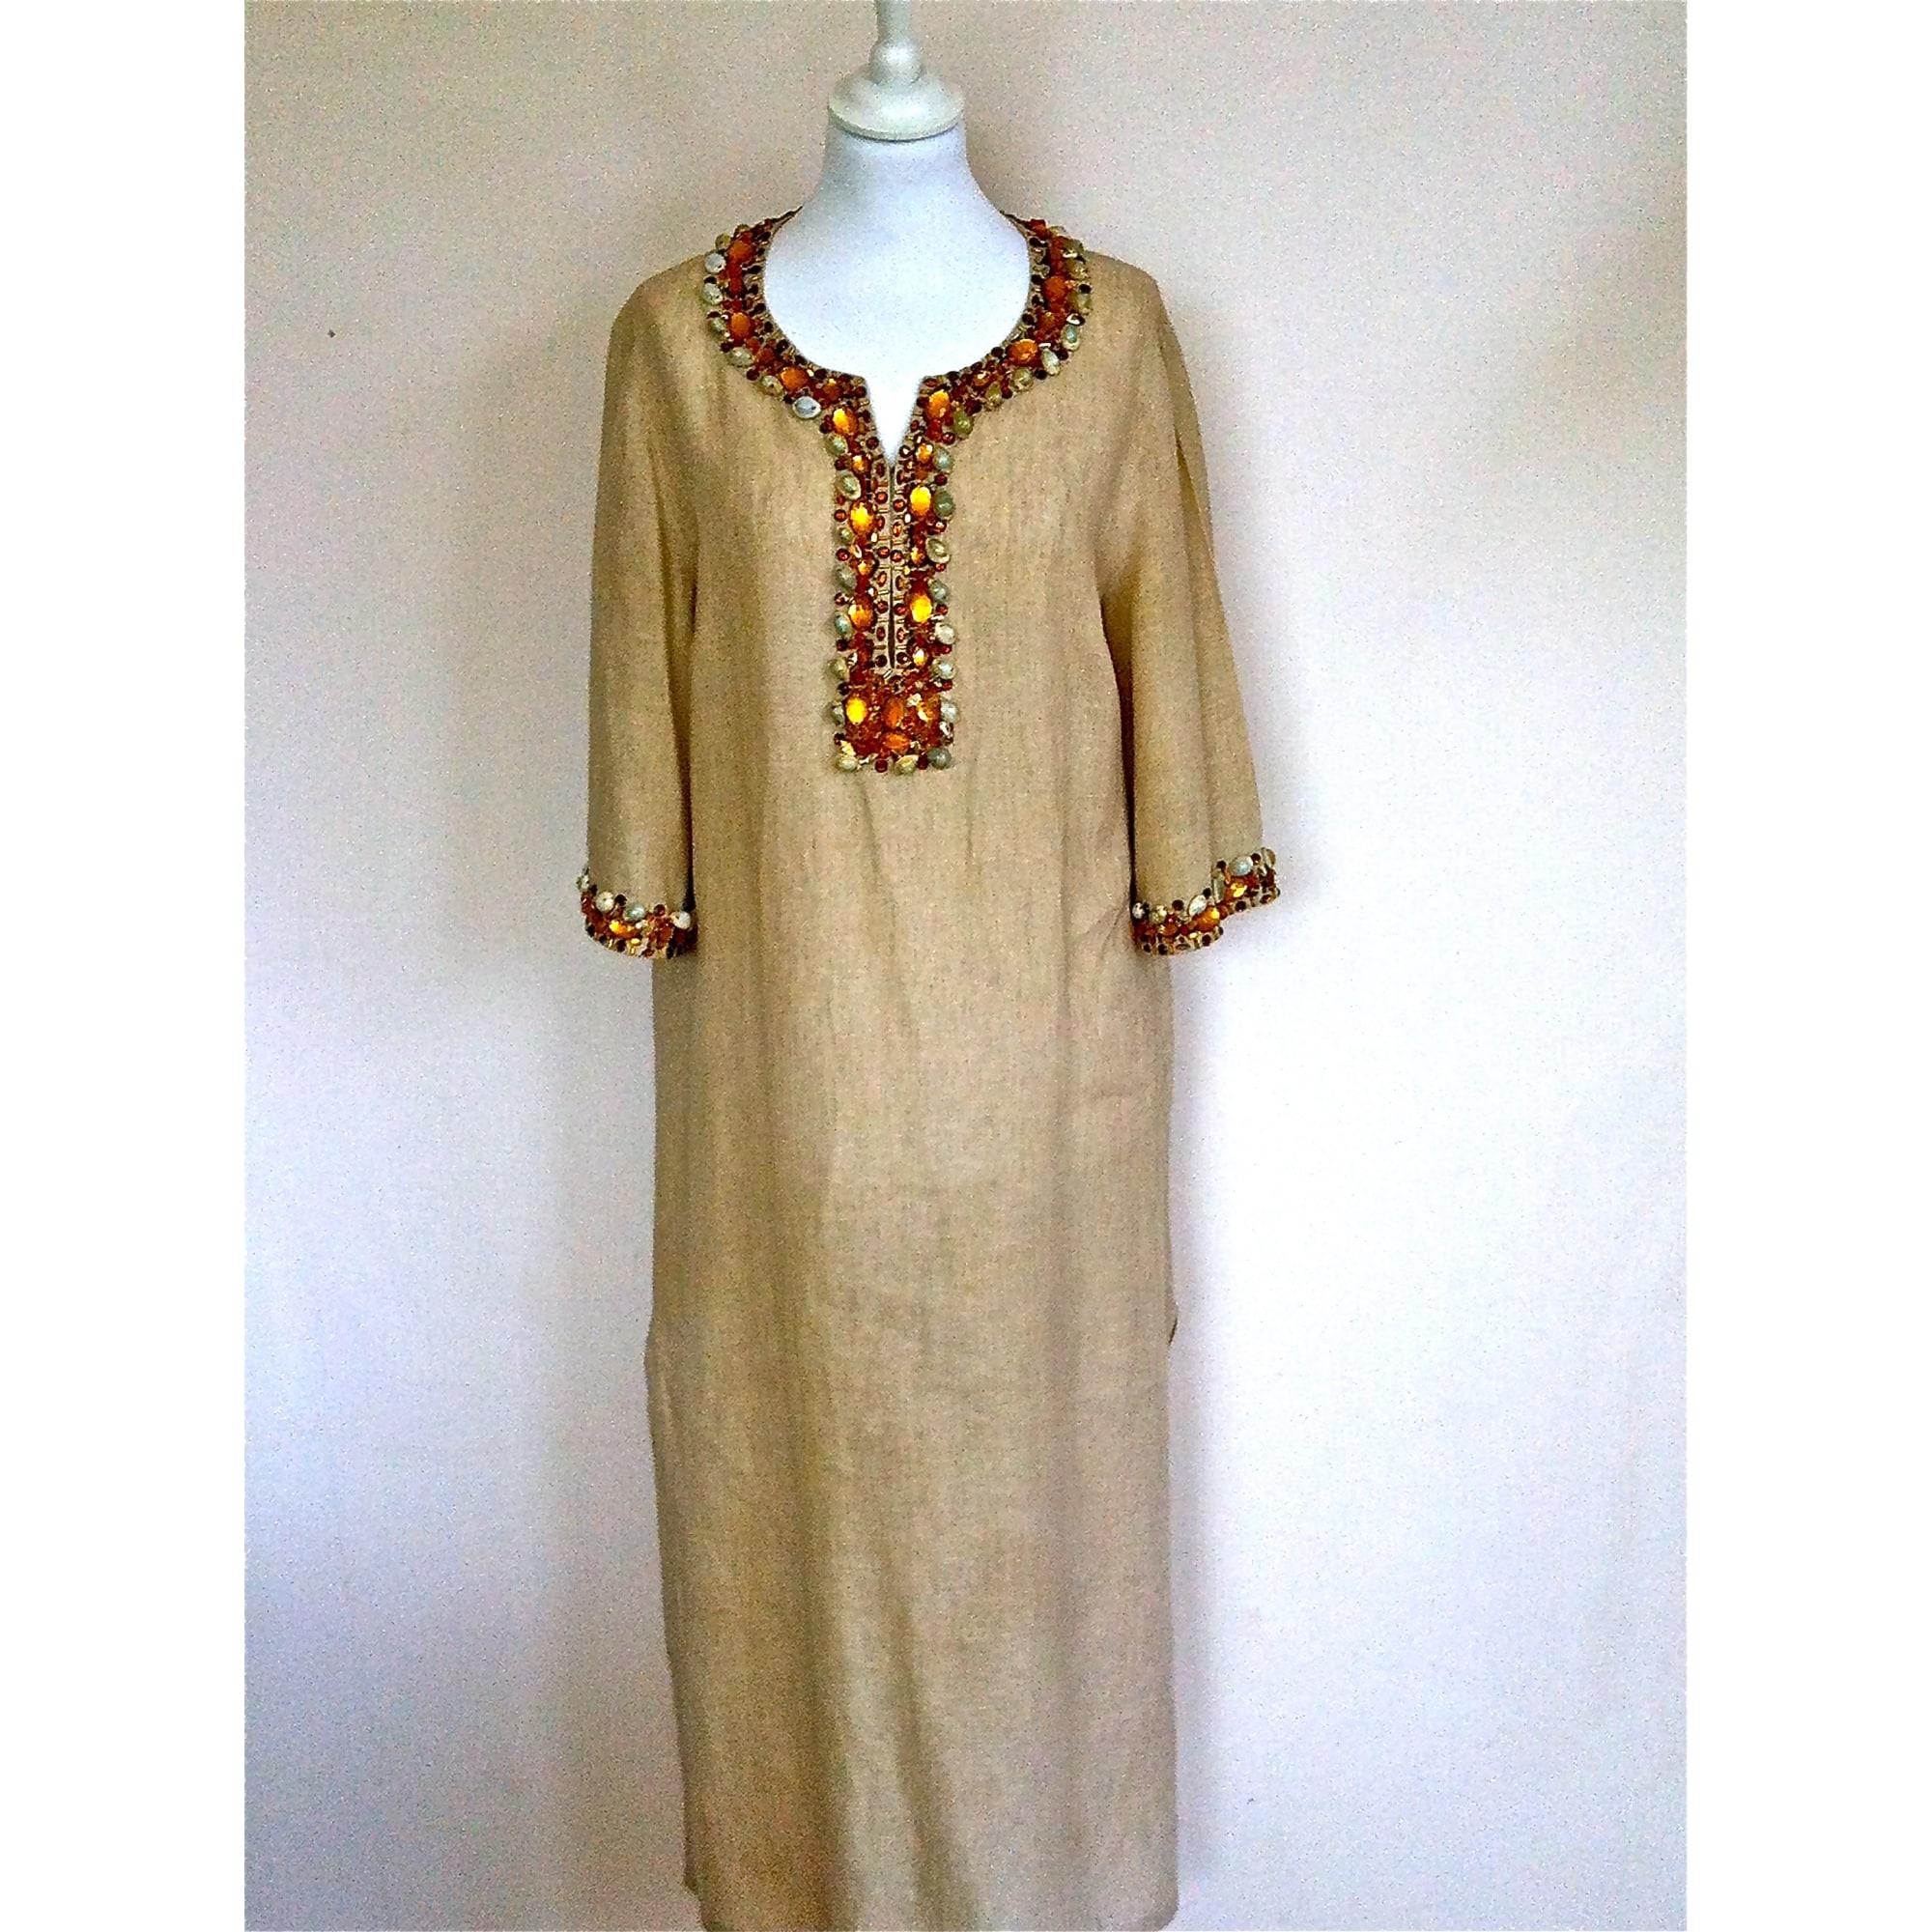 2cd0938860 Kaftan Dress LUISA SPAGNOLI 38 (M, T2) beige - 2729170